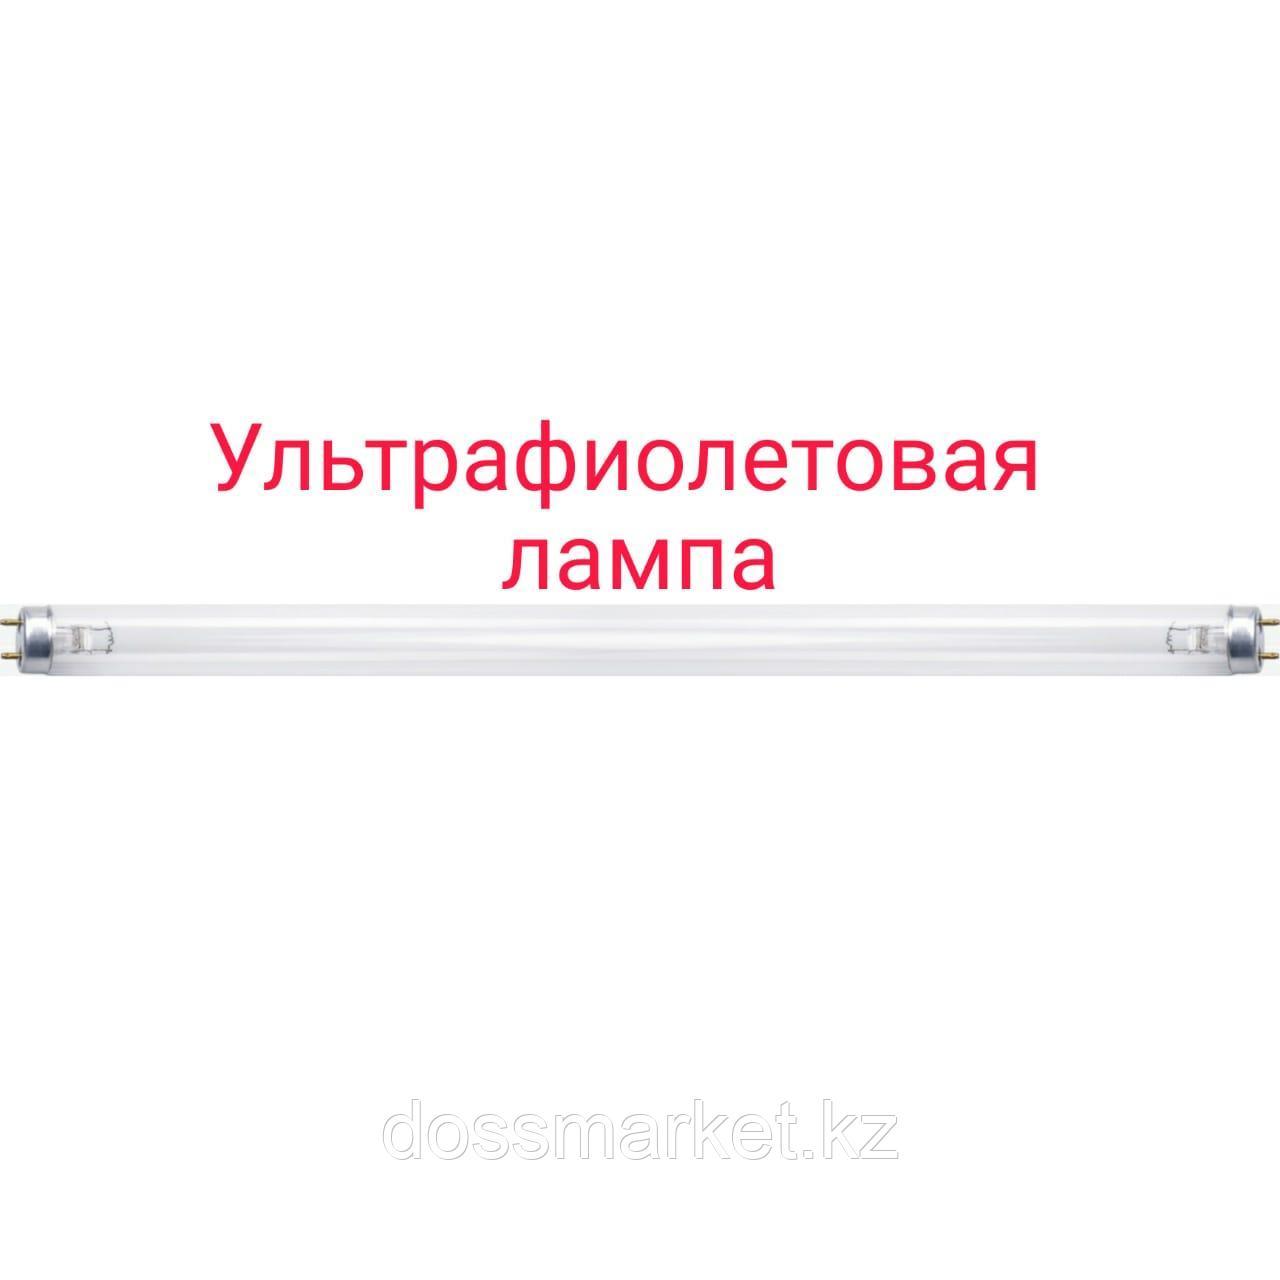 АКЦИЯ! Запасная Ультрафиолетовая  лампа 45см -15W, 60см - 25W, 90cm - 30W, 120см - 36W